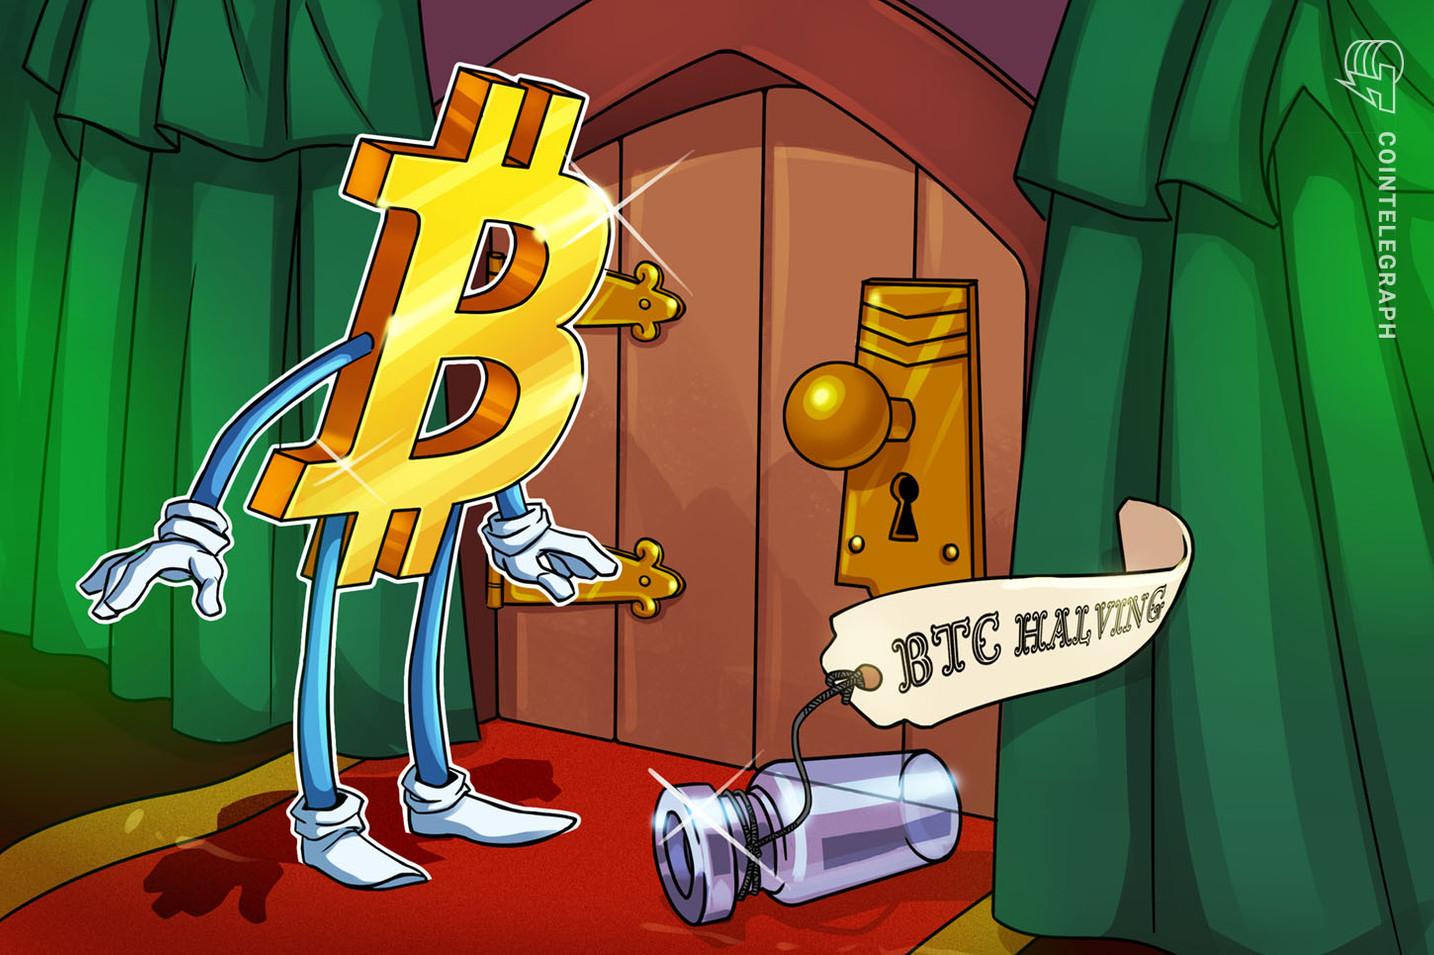 Forks de Bitcoin oscilam apesar de chegada de halvings